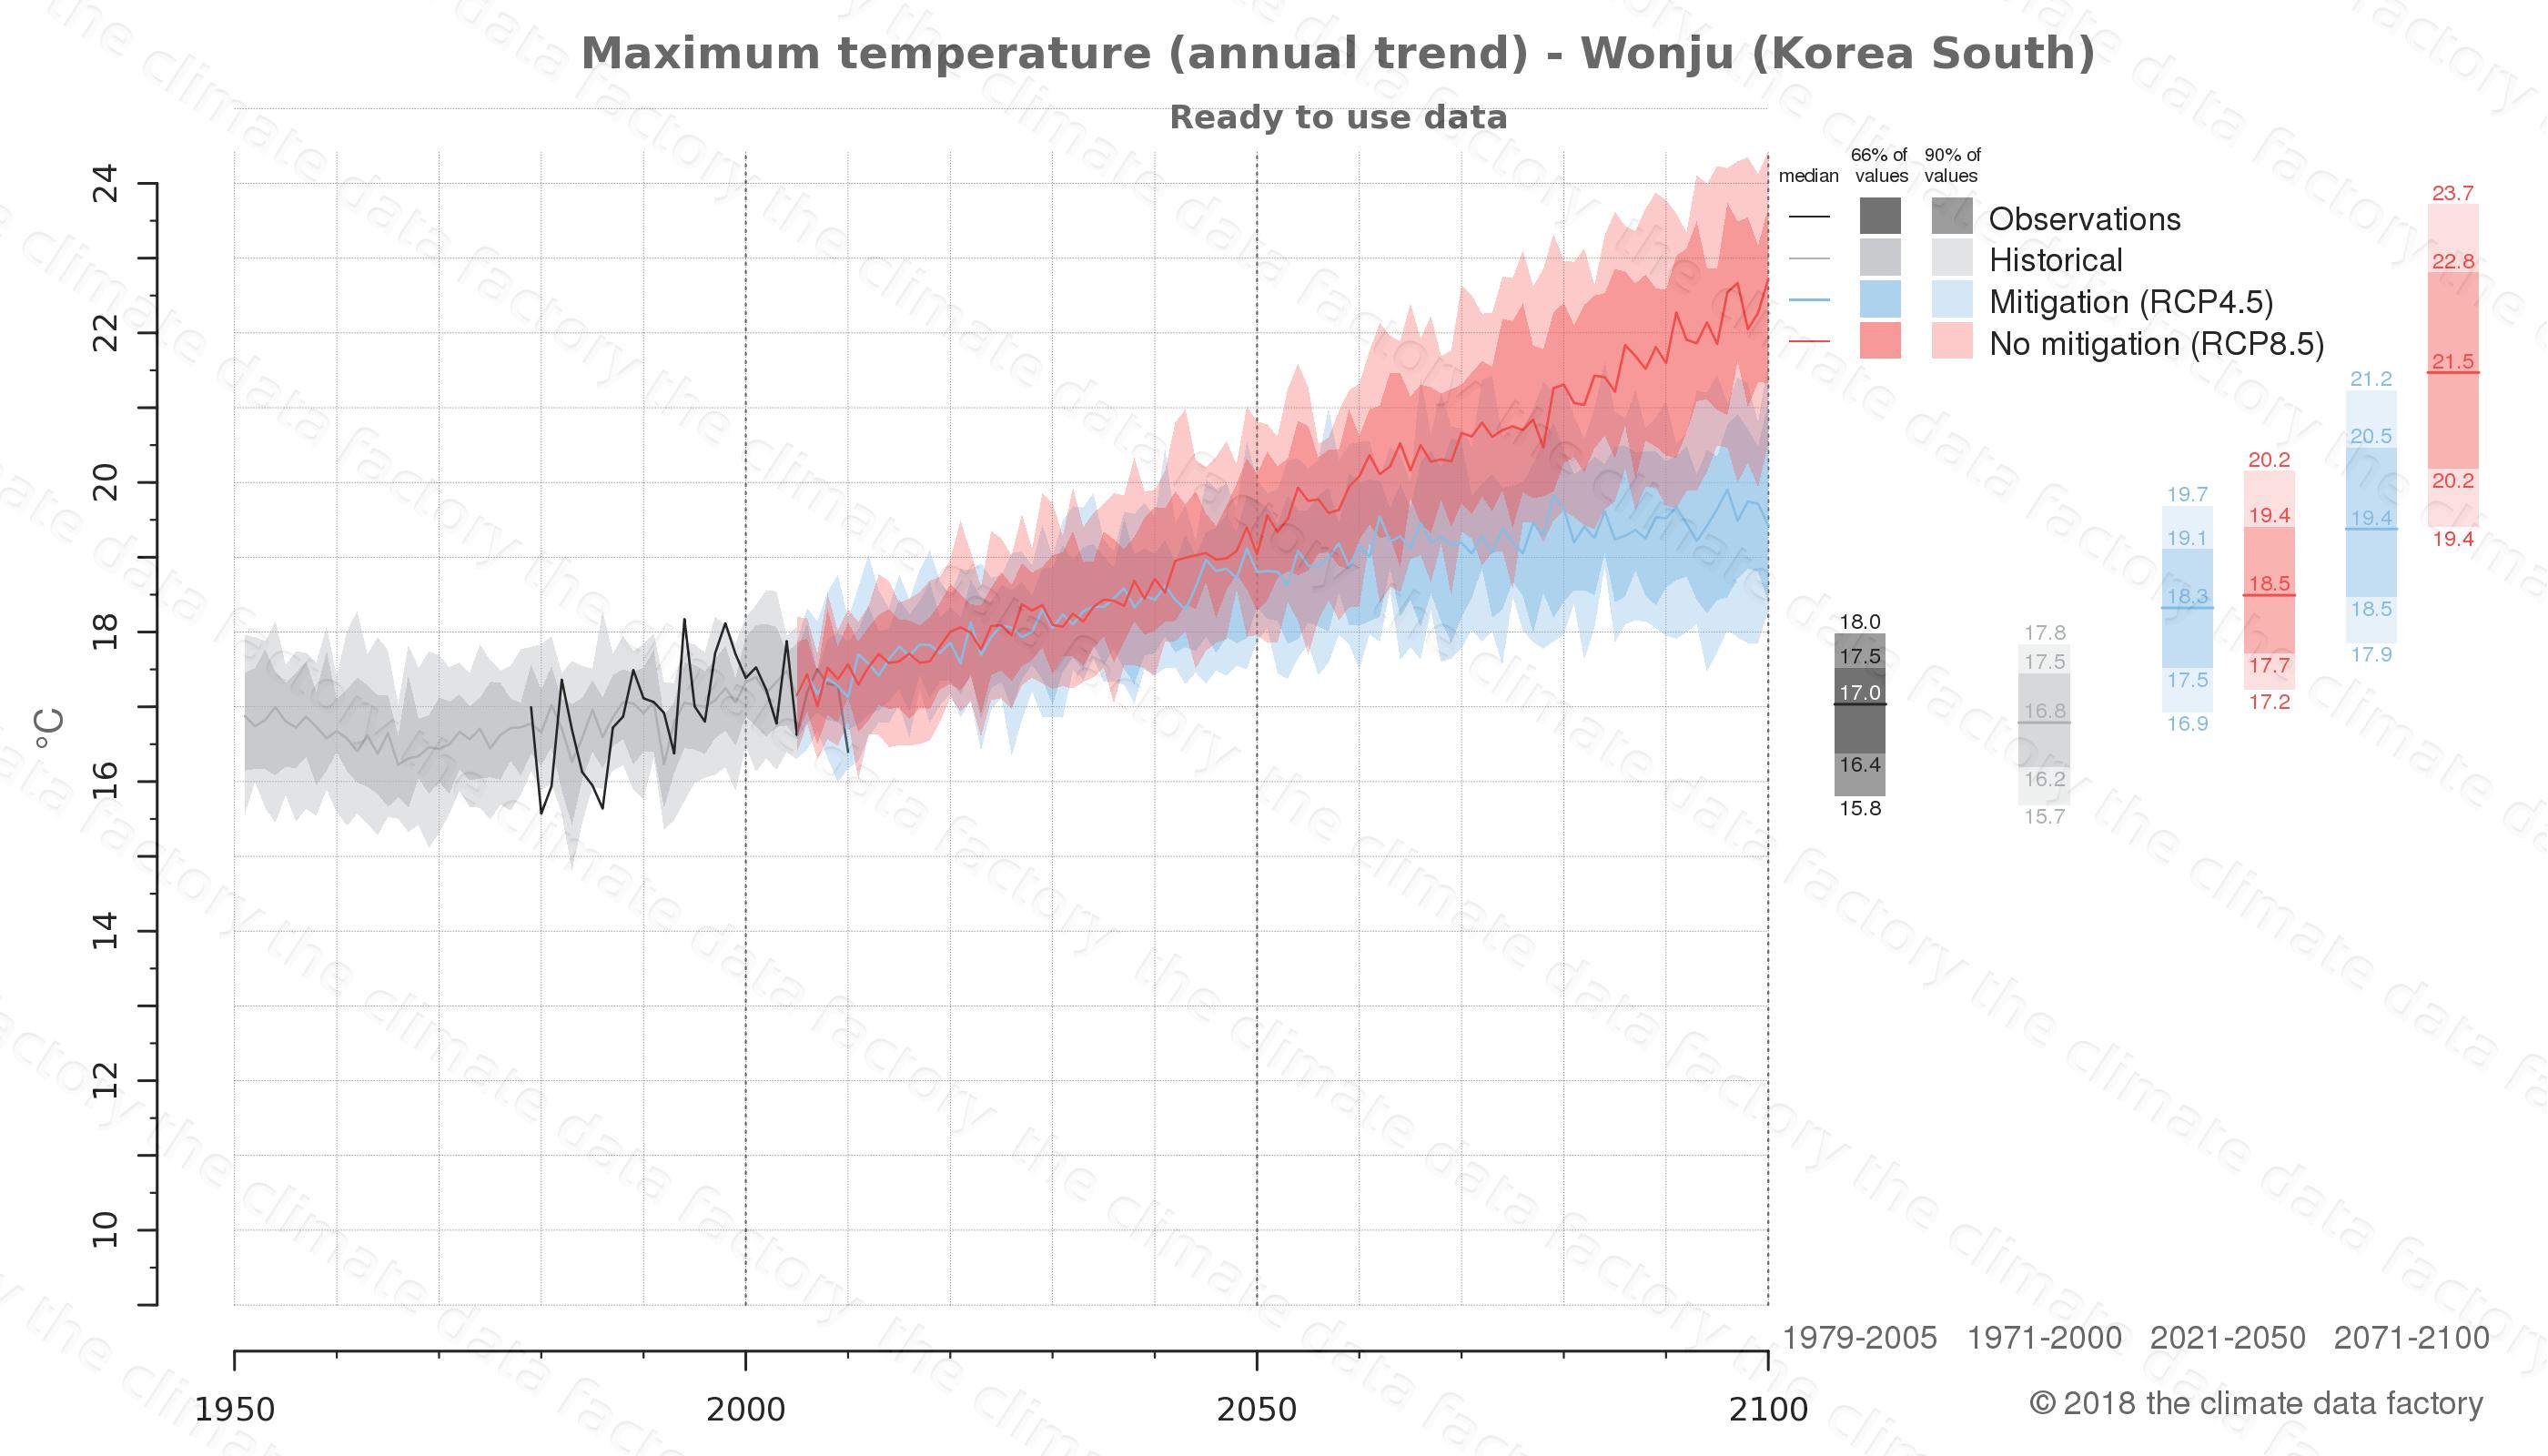 climate change data policy adaptation climate graph city data maximum-temperature wonju south korea